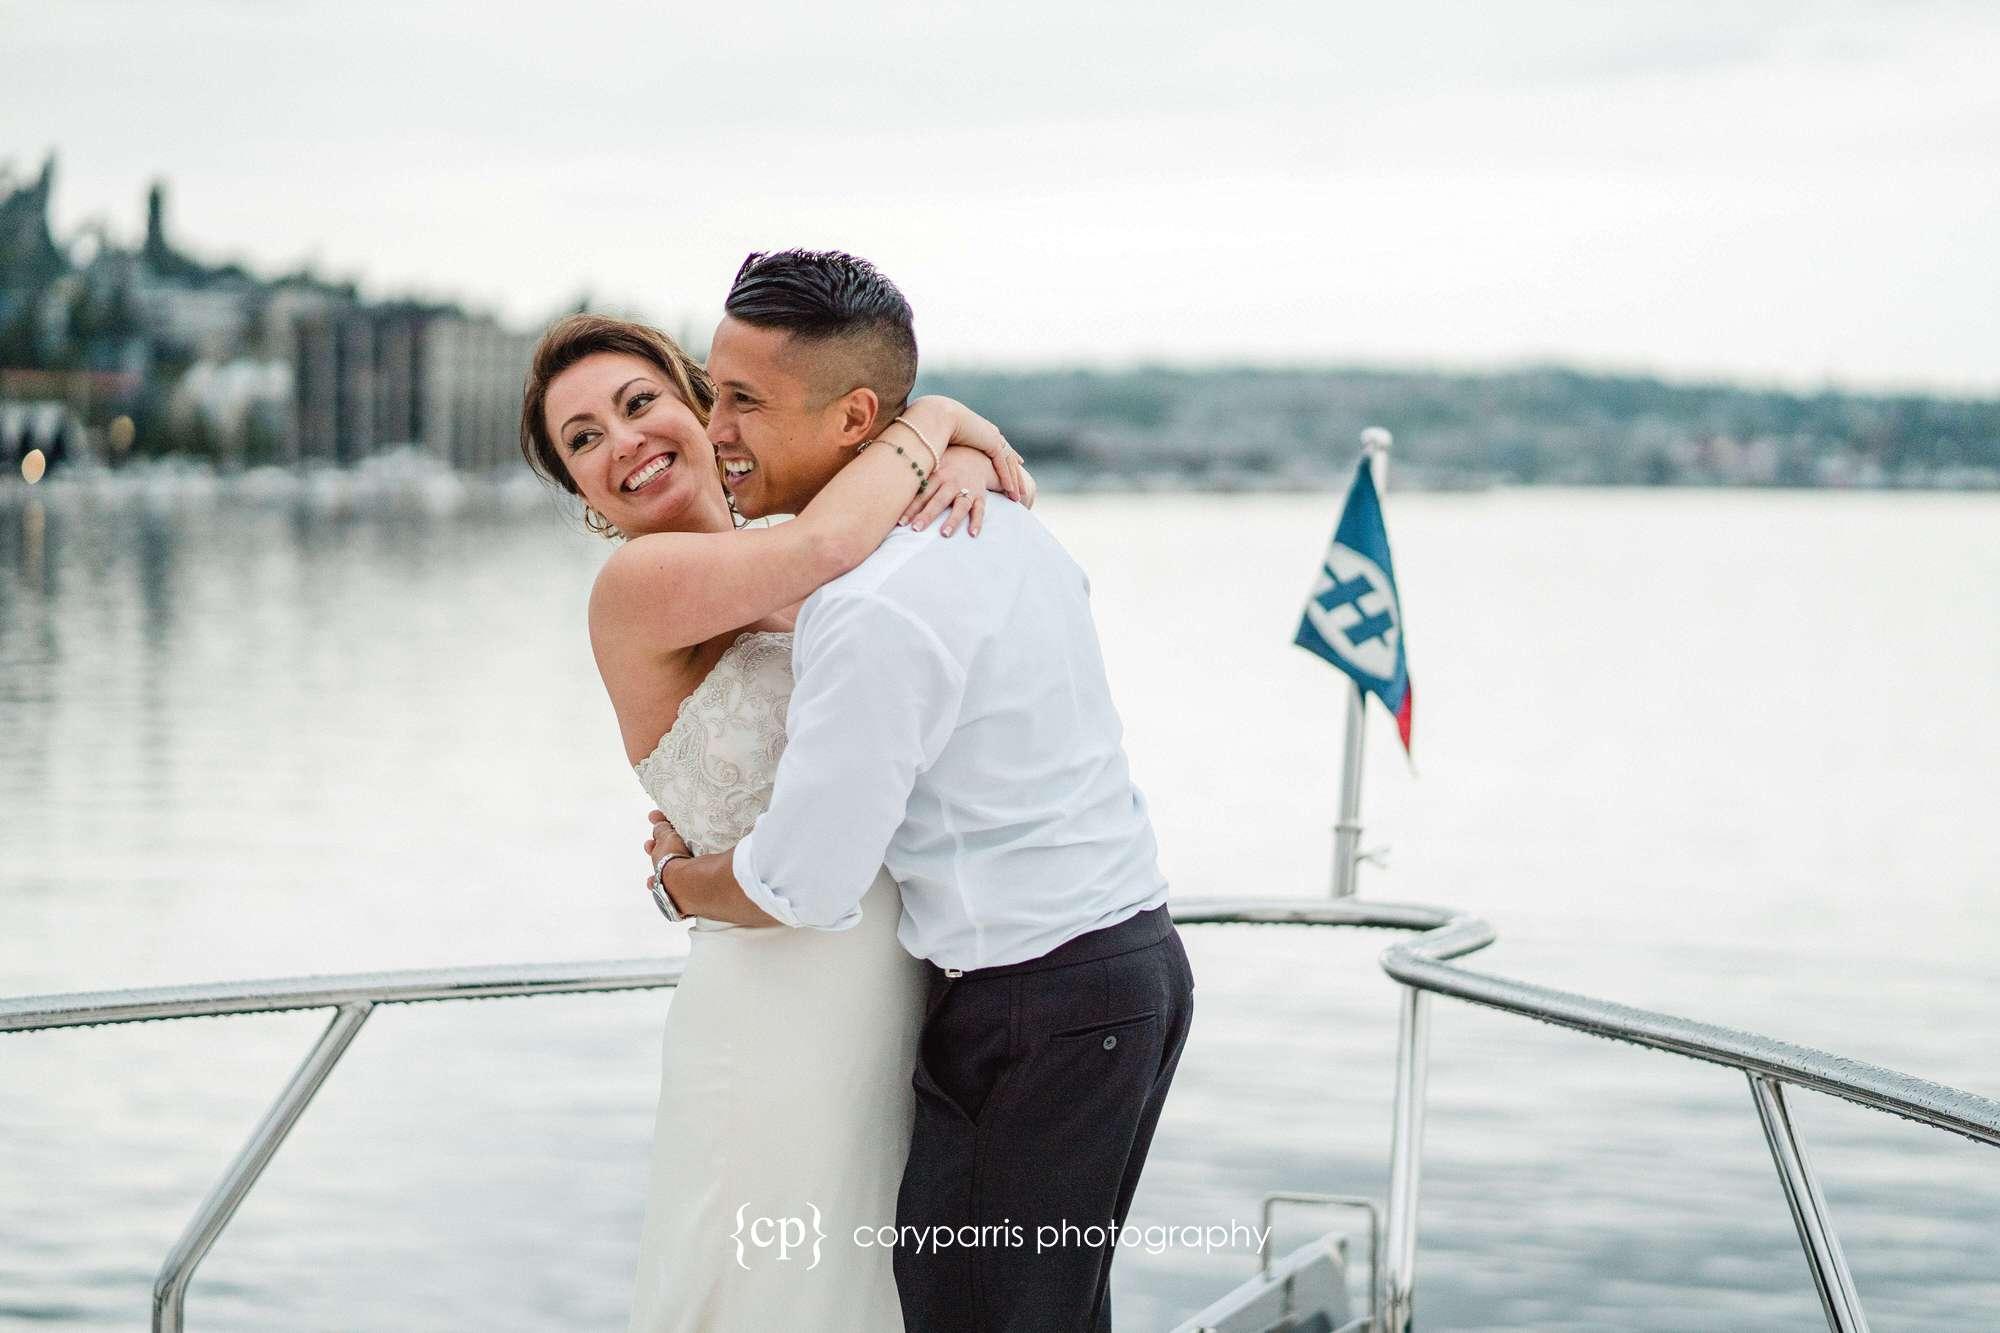 529-seattle-courthouse-wedding-photography.jpg